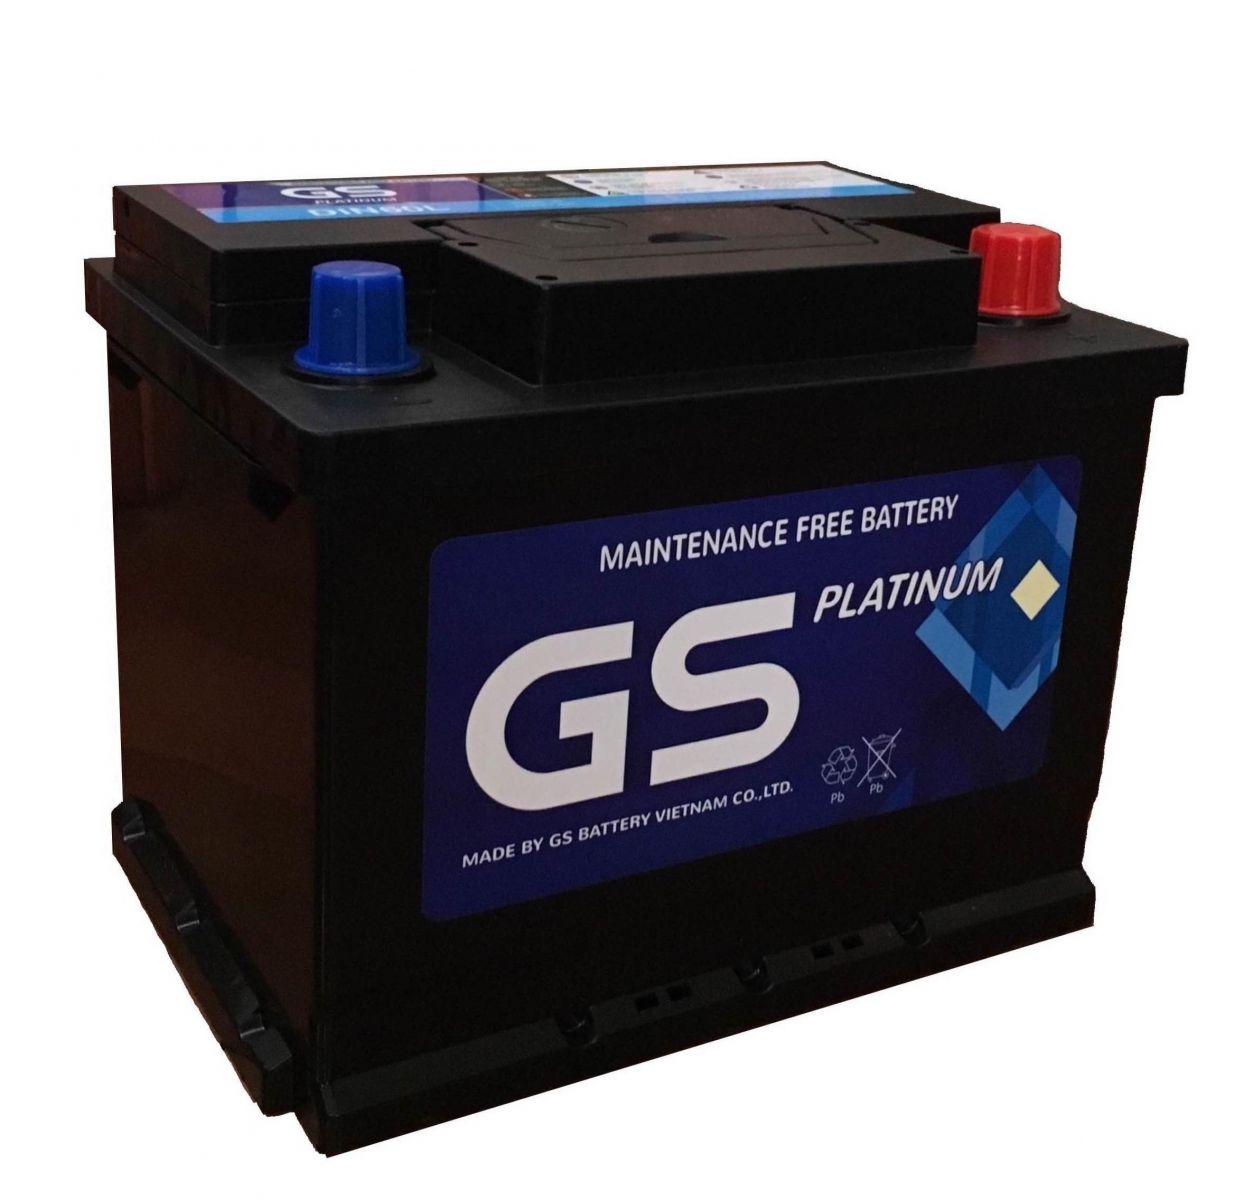 Ắc quy GS 65Ah (L) Platinum